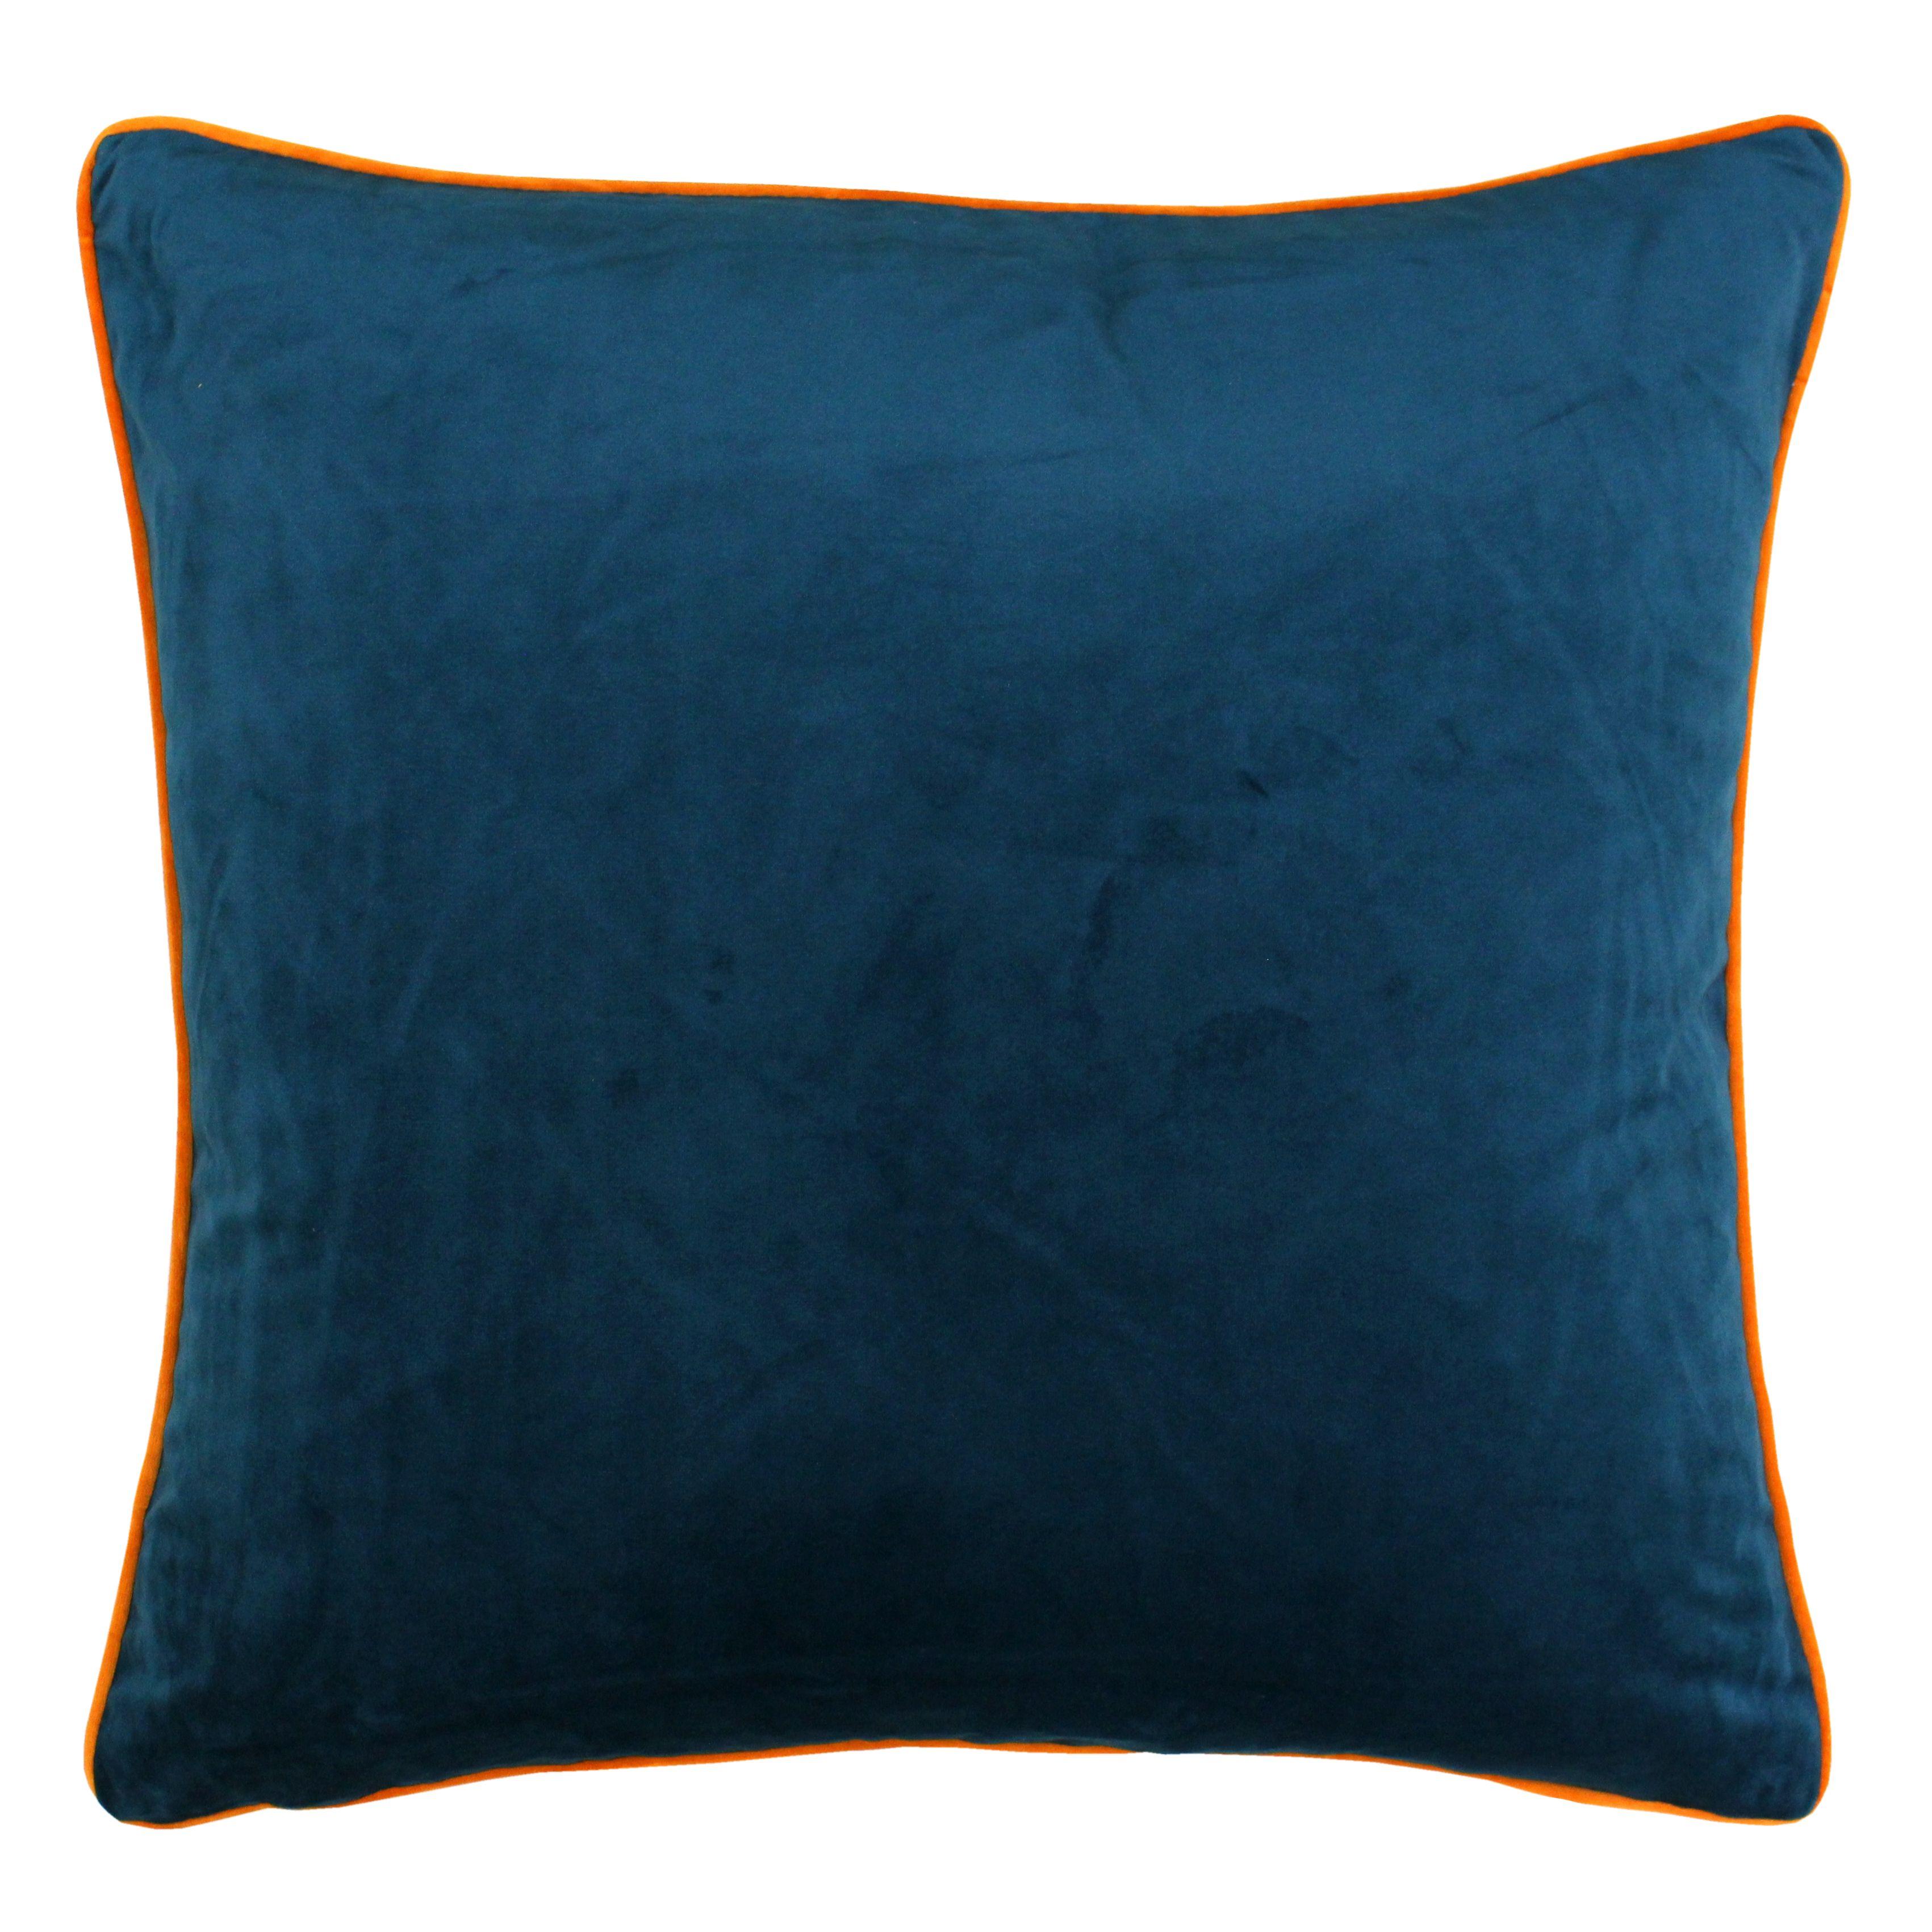 Meridian 55X55 Poly Cushion Tea/Cle